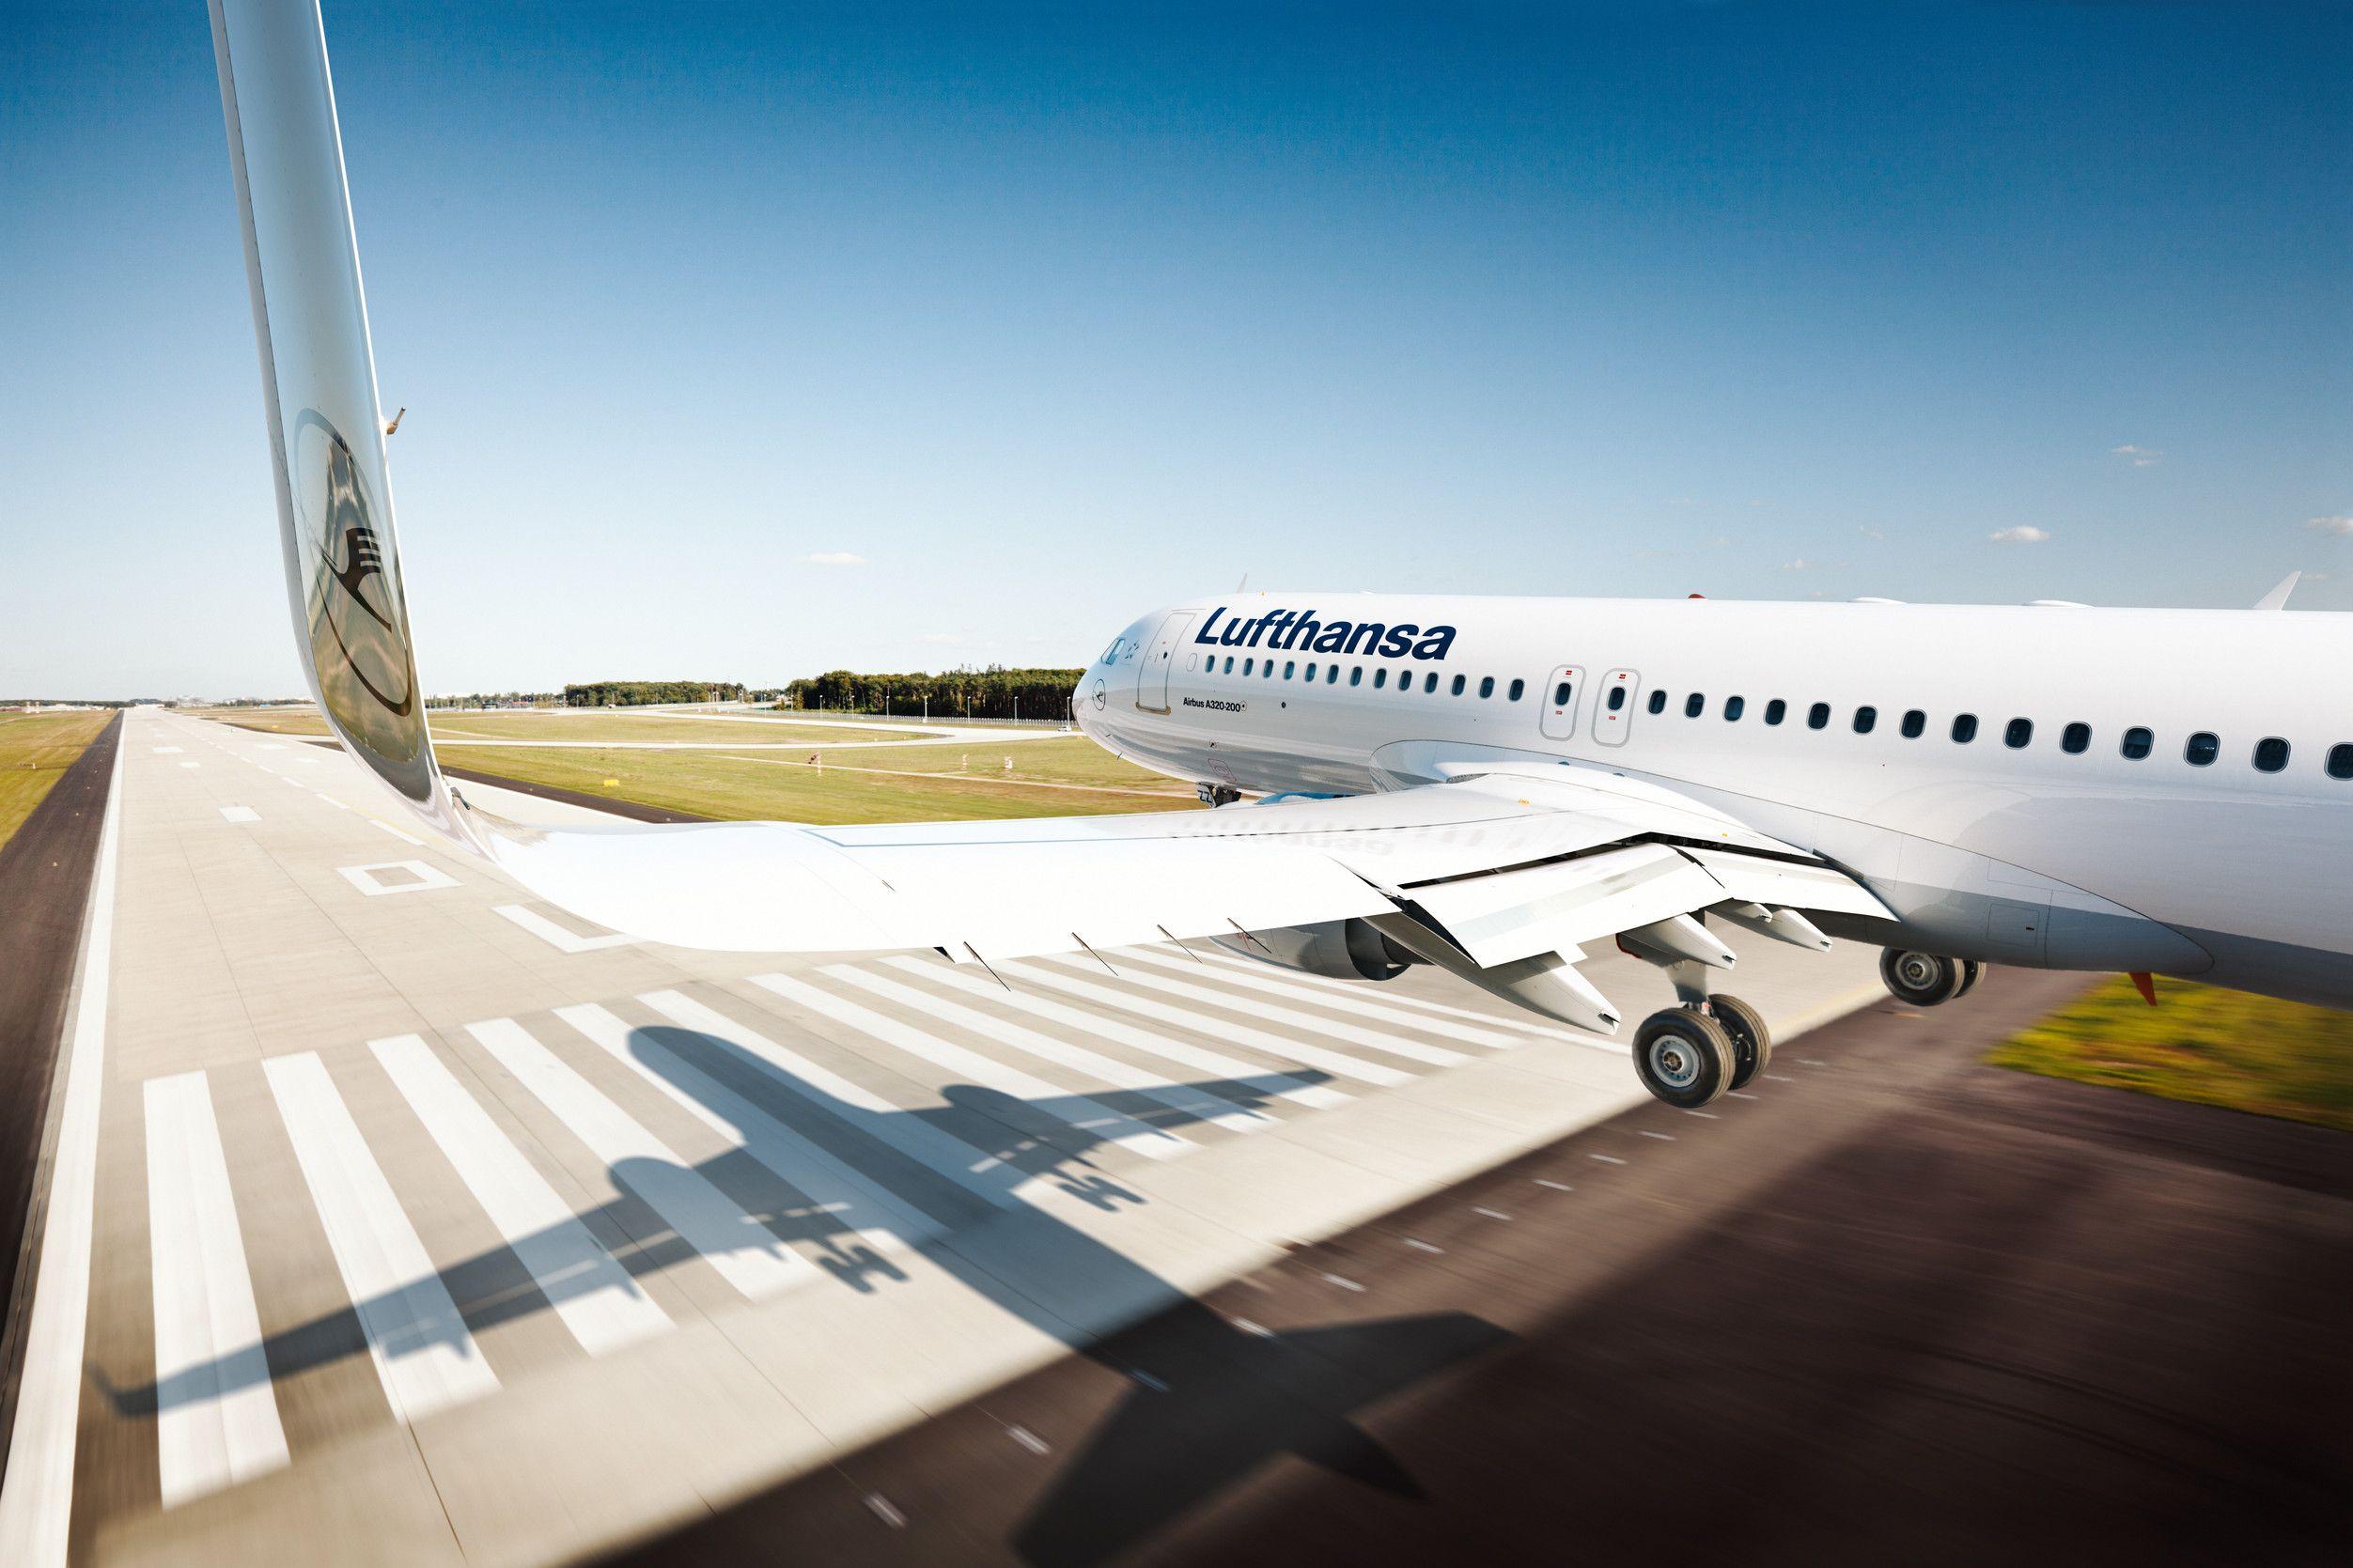 Lufthansa Fleet Airfleets aviation - mandegar info